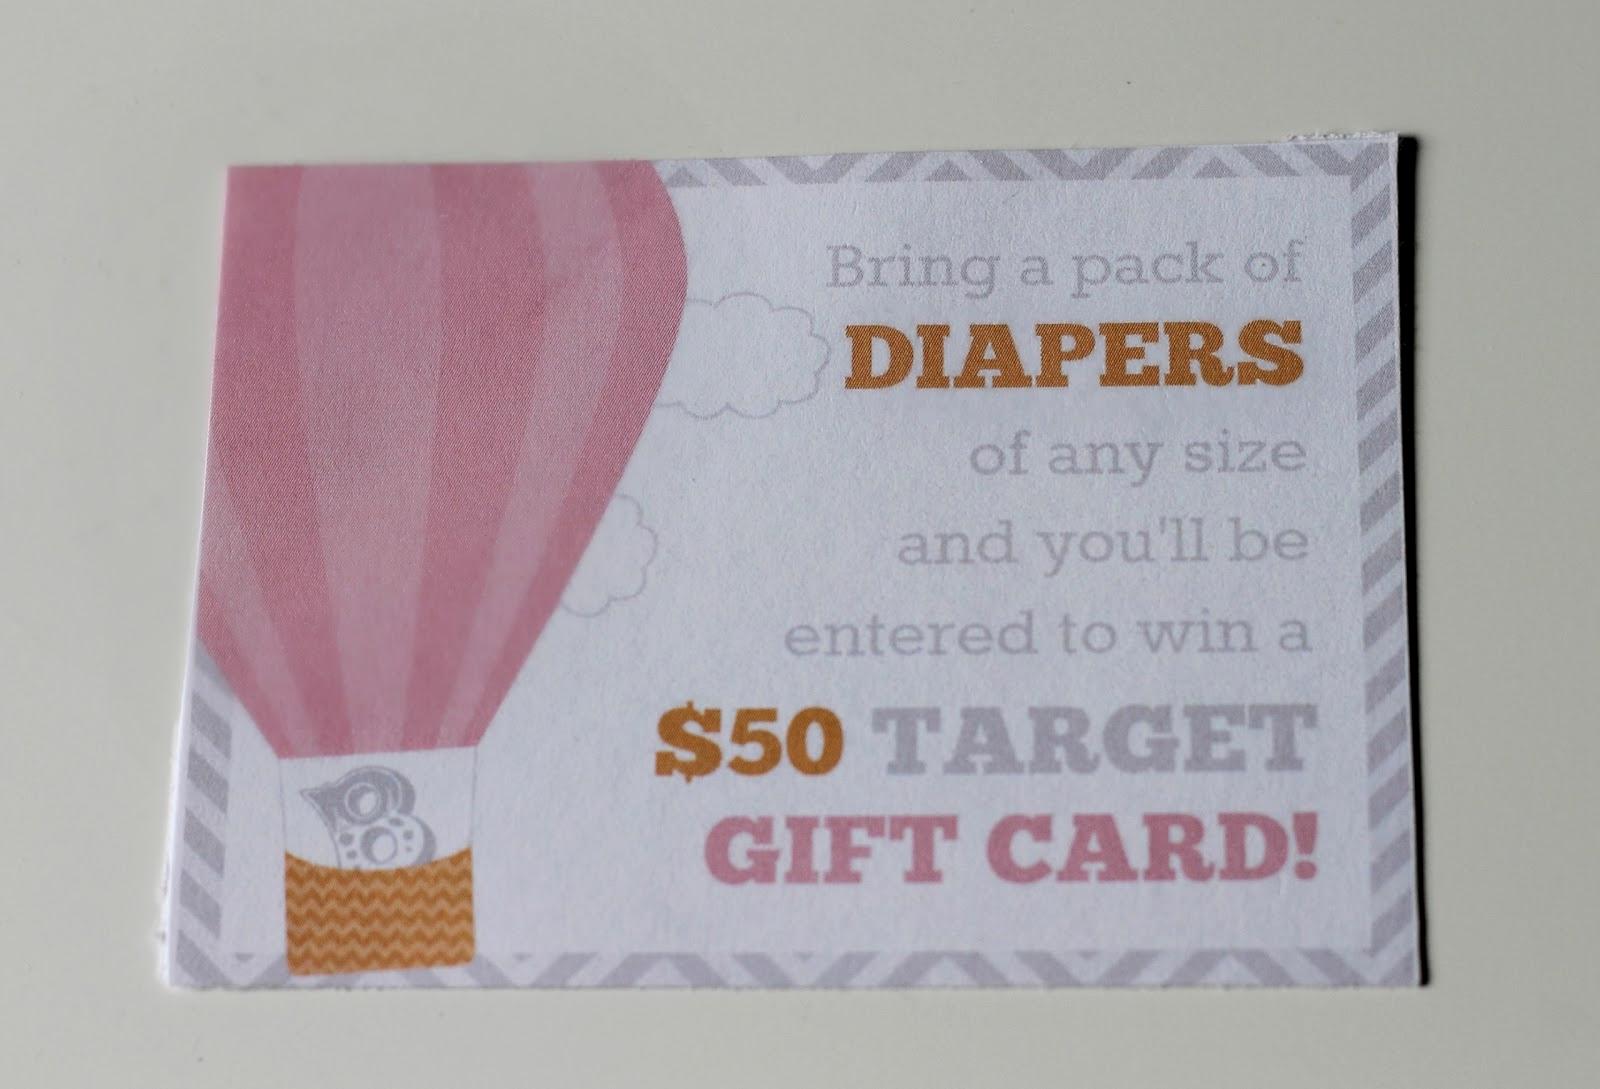 Free Diaper Party Invitation Templates Beautiful Diaper Party Invitations Templates